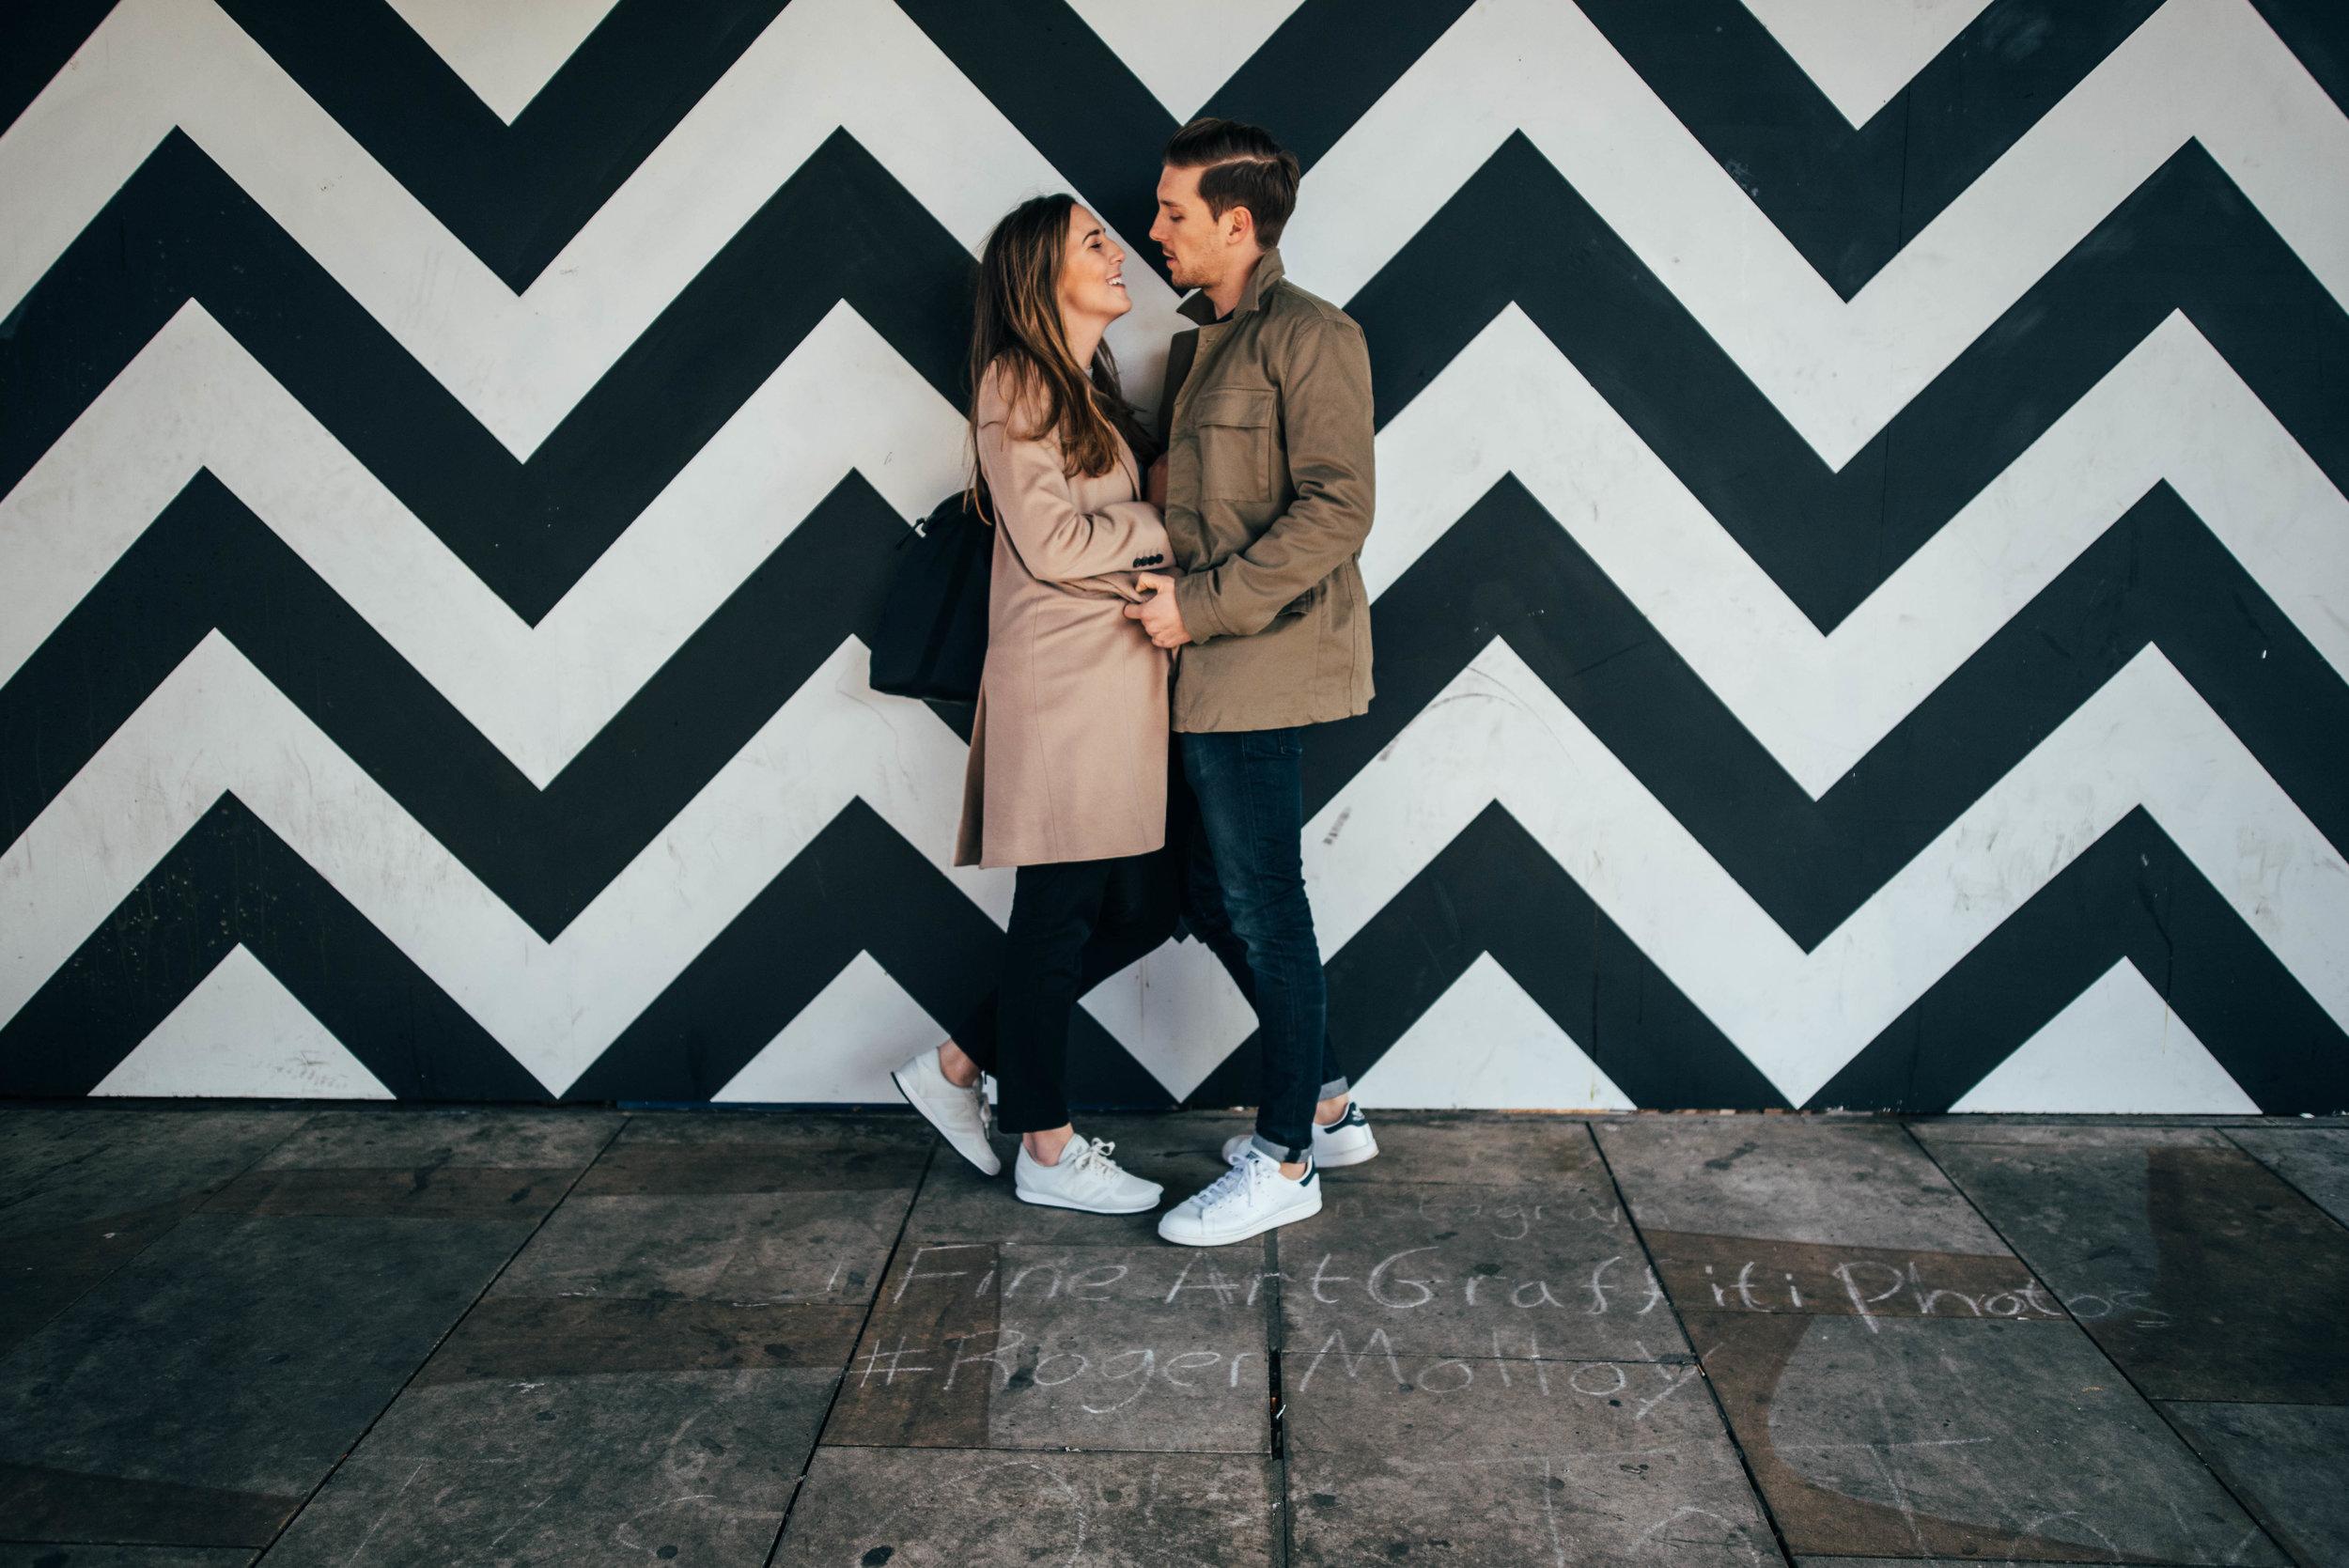 Modern Urban Shoreditch Love Shoot Essex UK Documentary Wedding Photographer